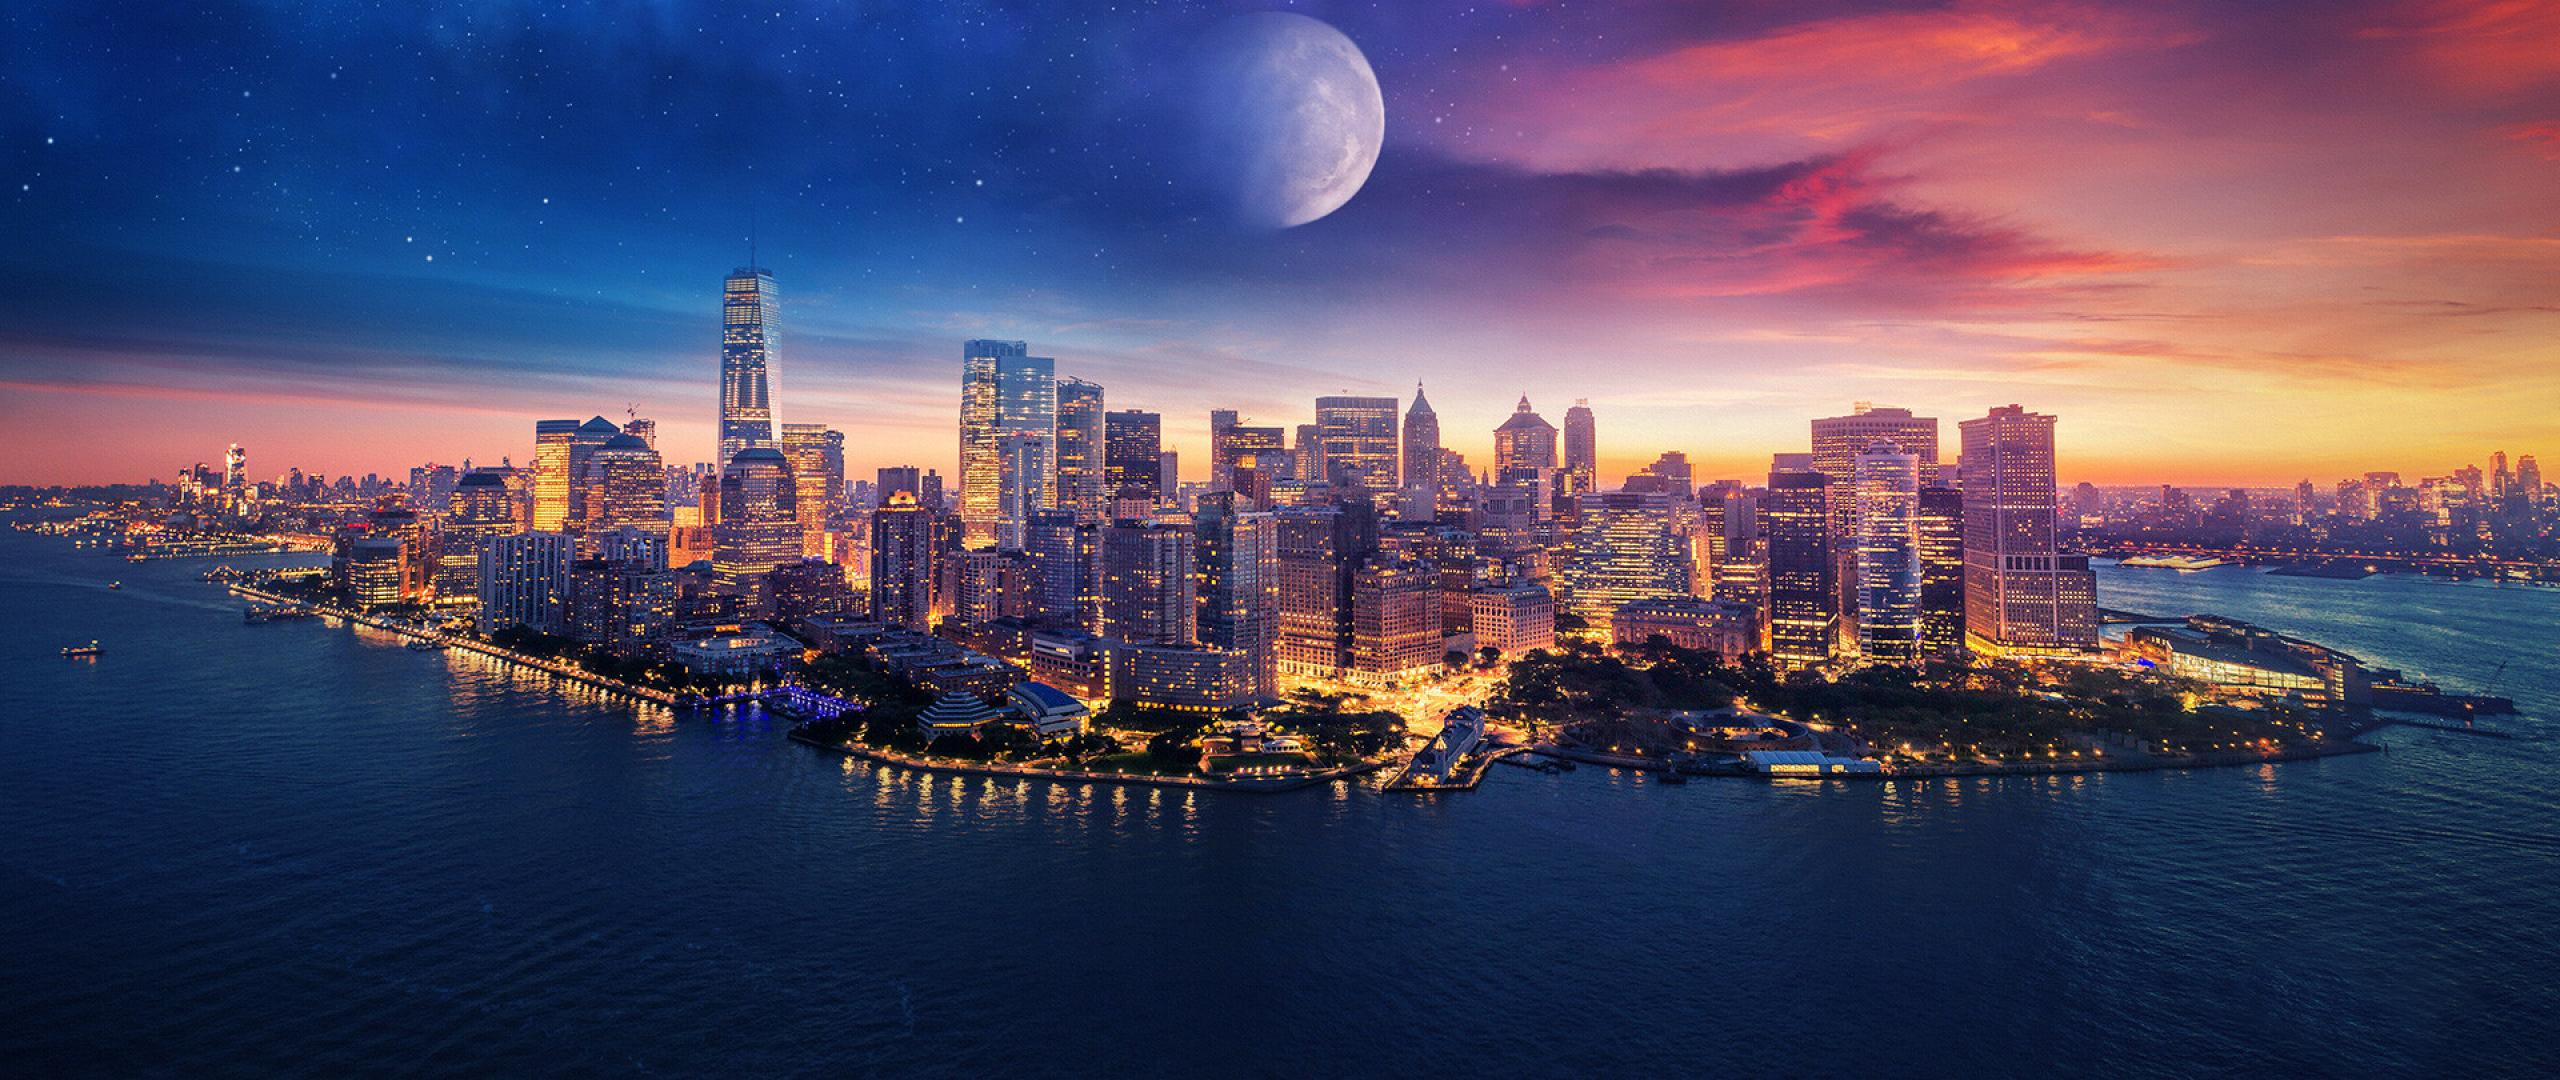 2560x1080 New York City Art 2560x1080 Resolution Wallpaper ...